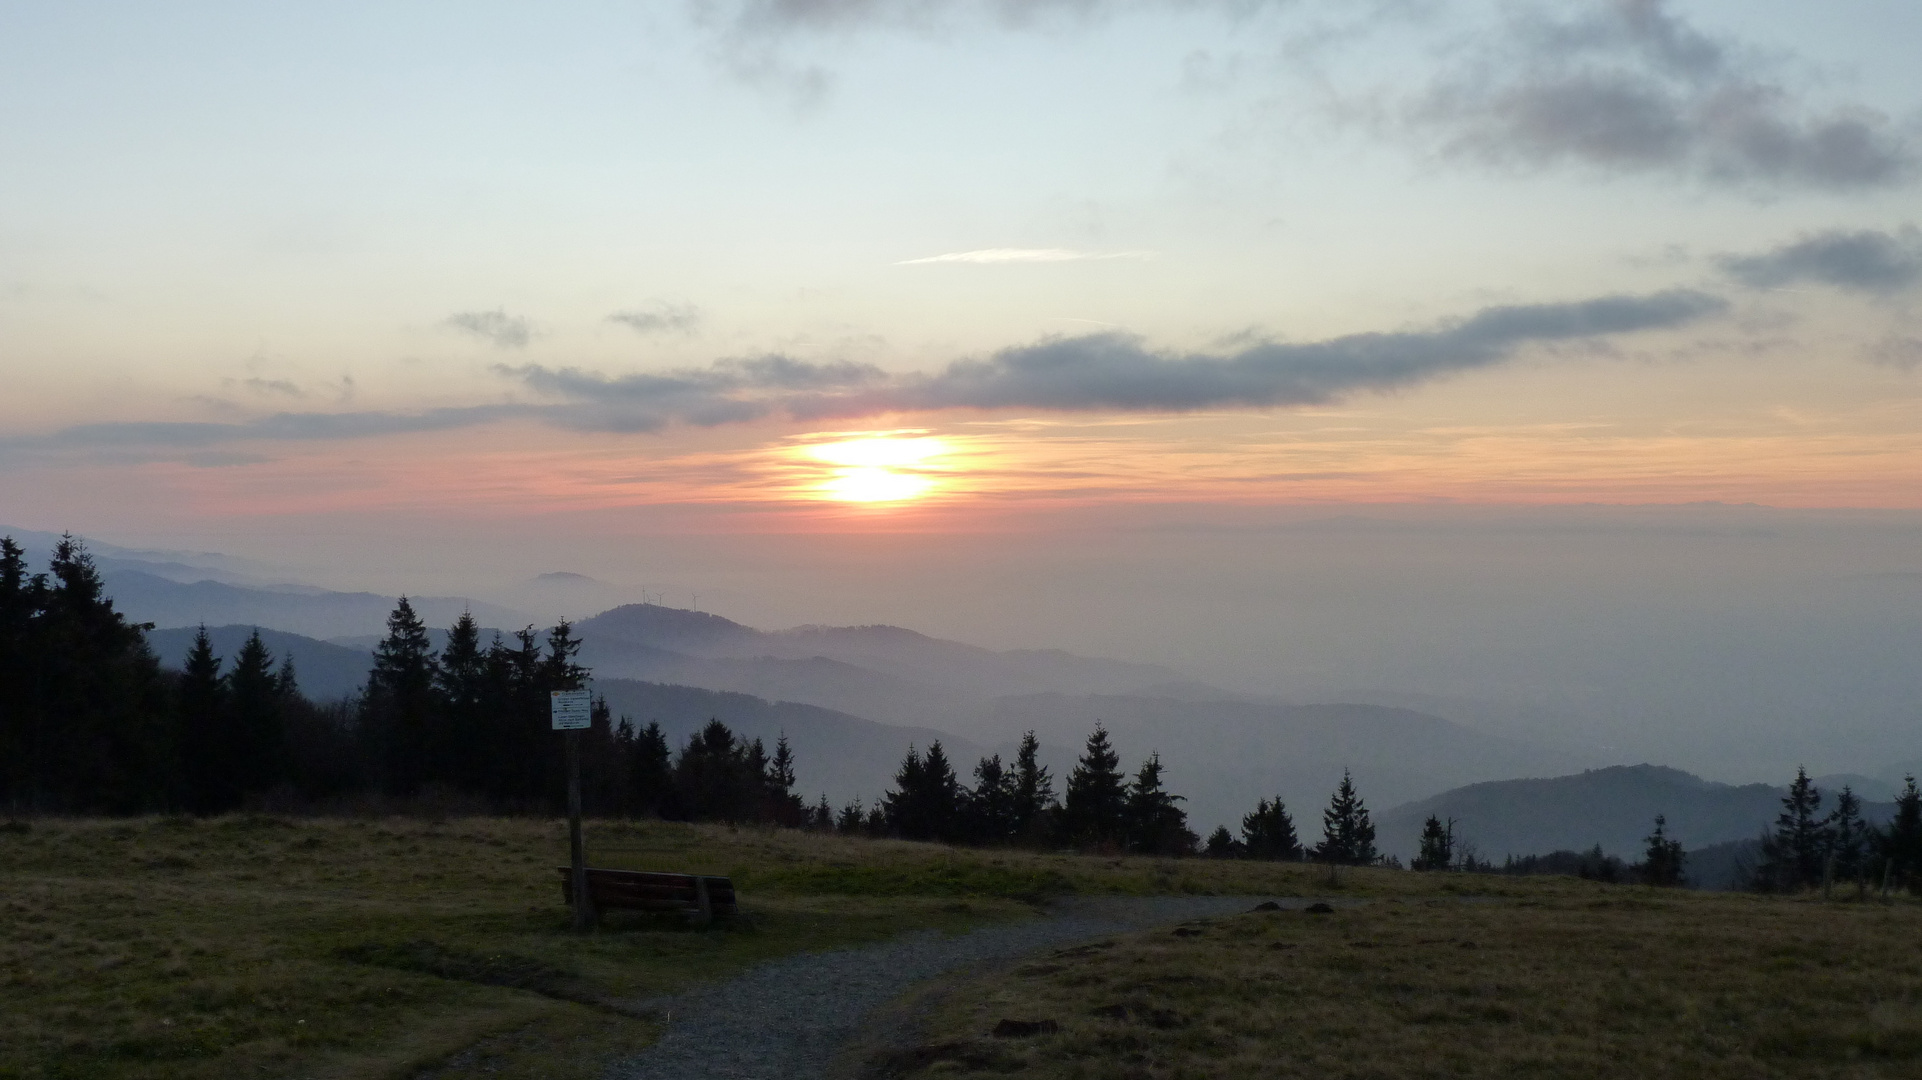 Sonnenuntergang auf dem Kandel